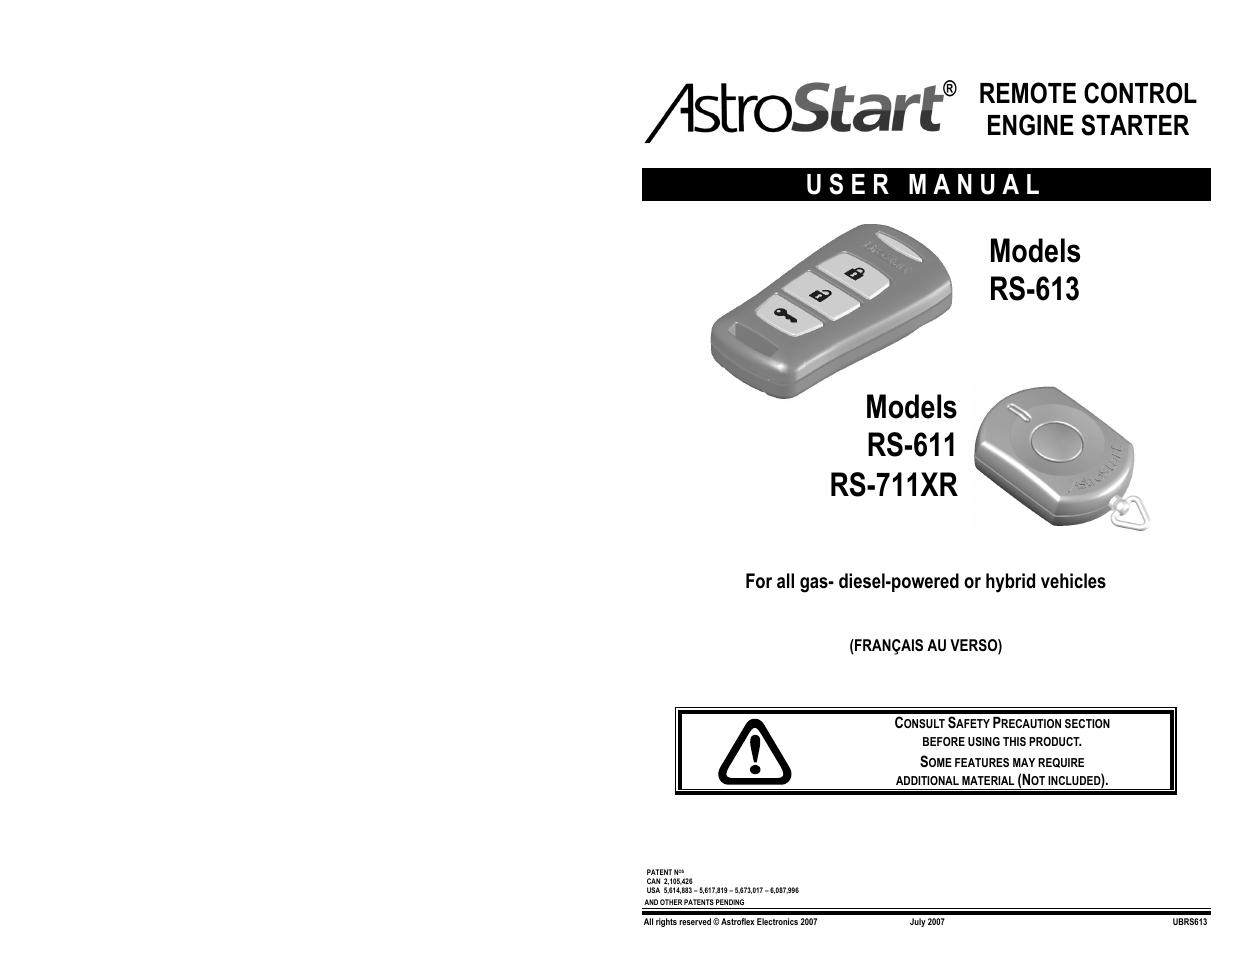 remote start wiring diagrams high pressure sodium ballast diagram for astrostart starter 44